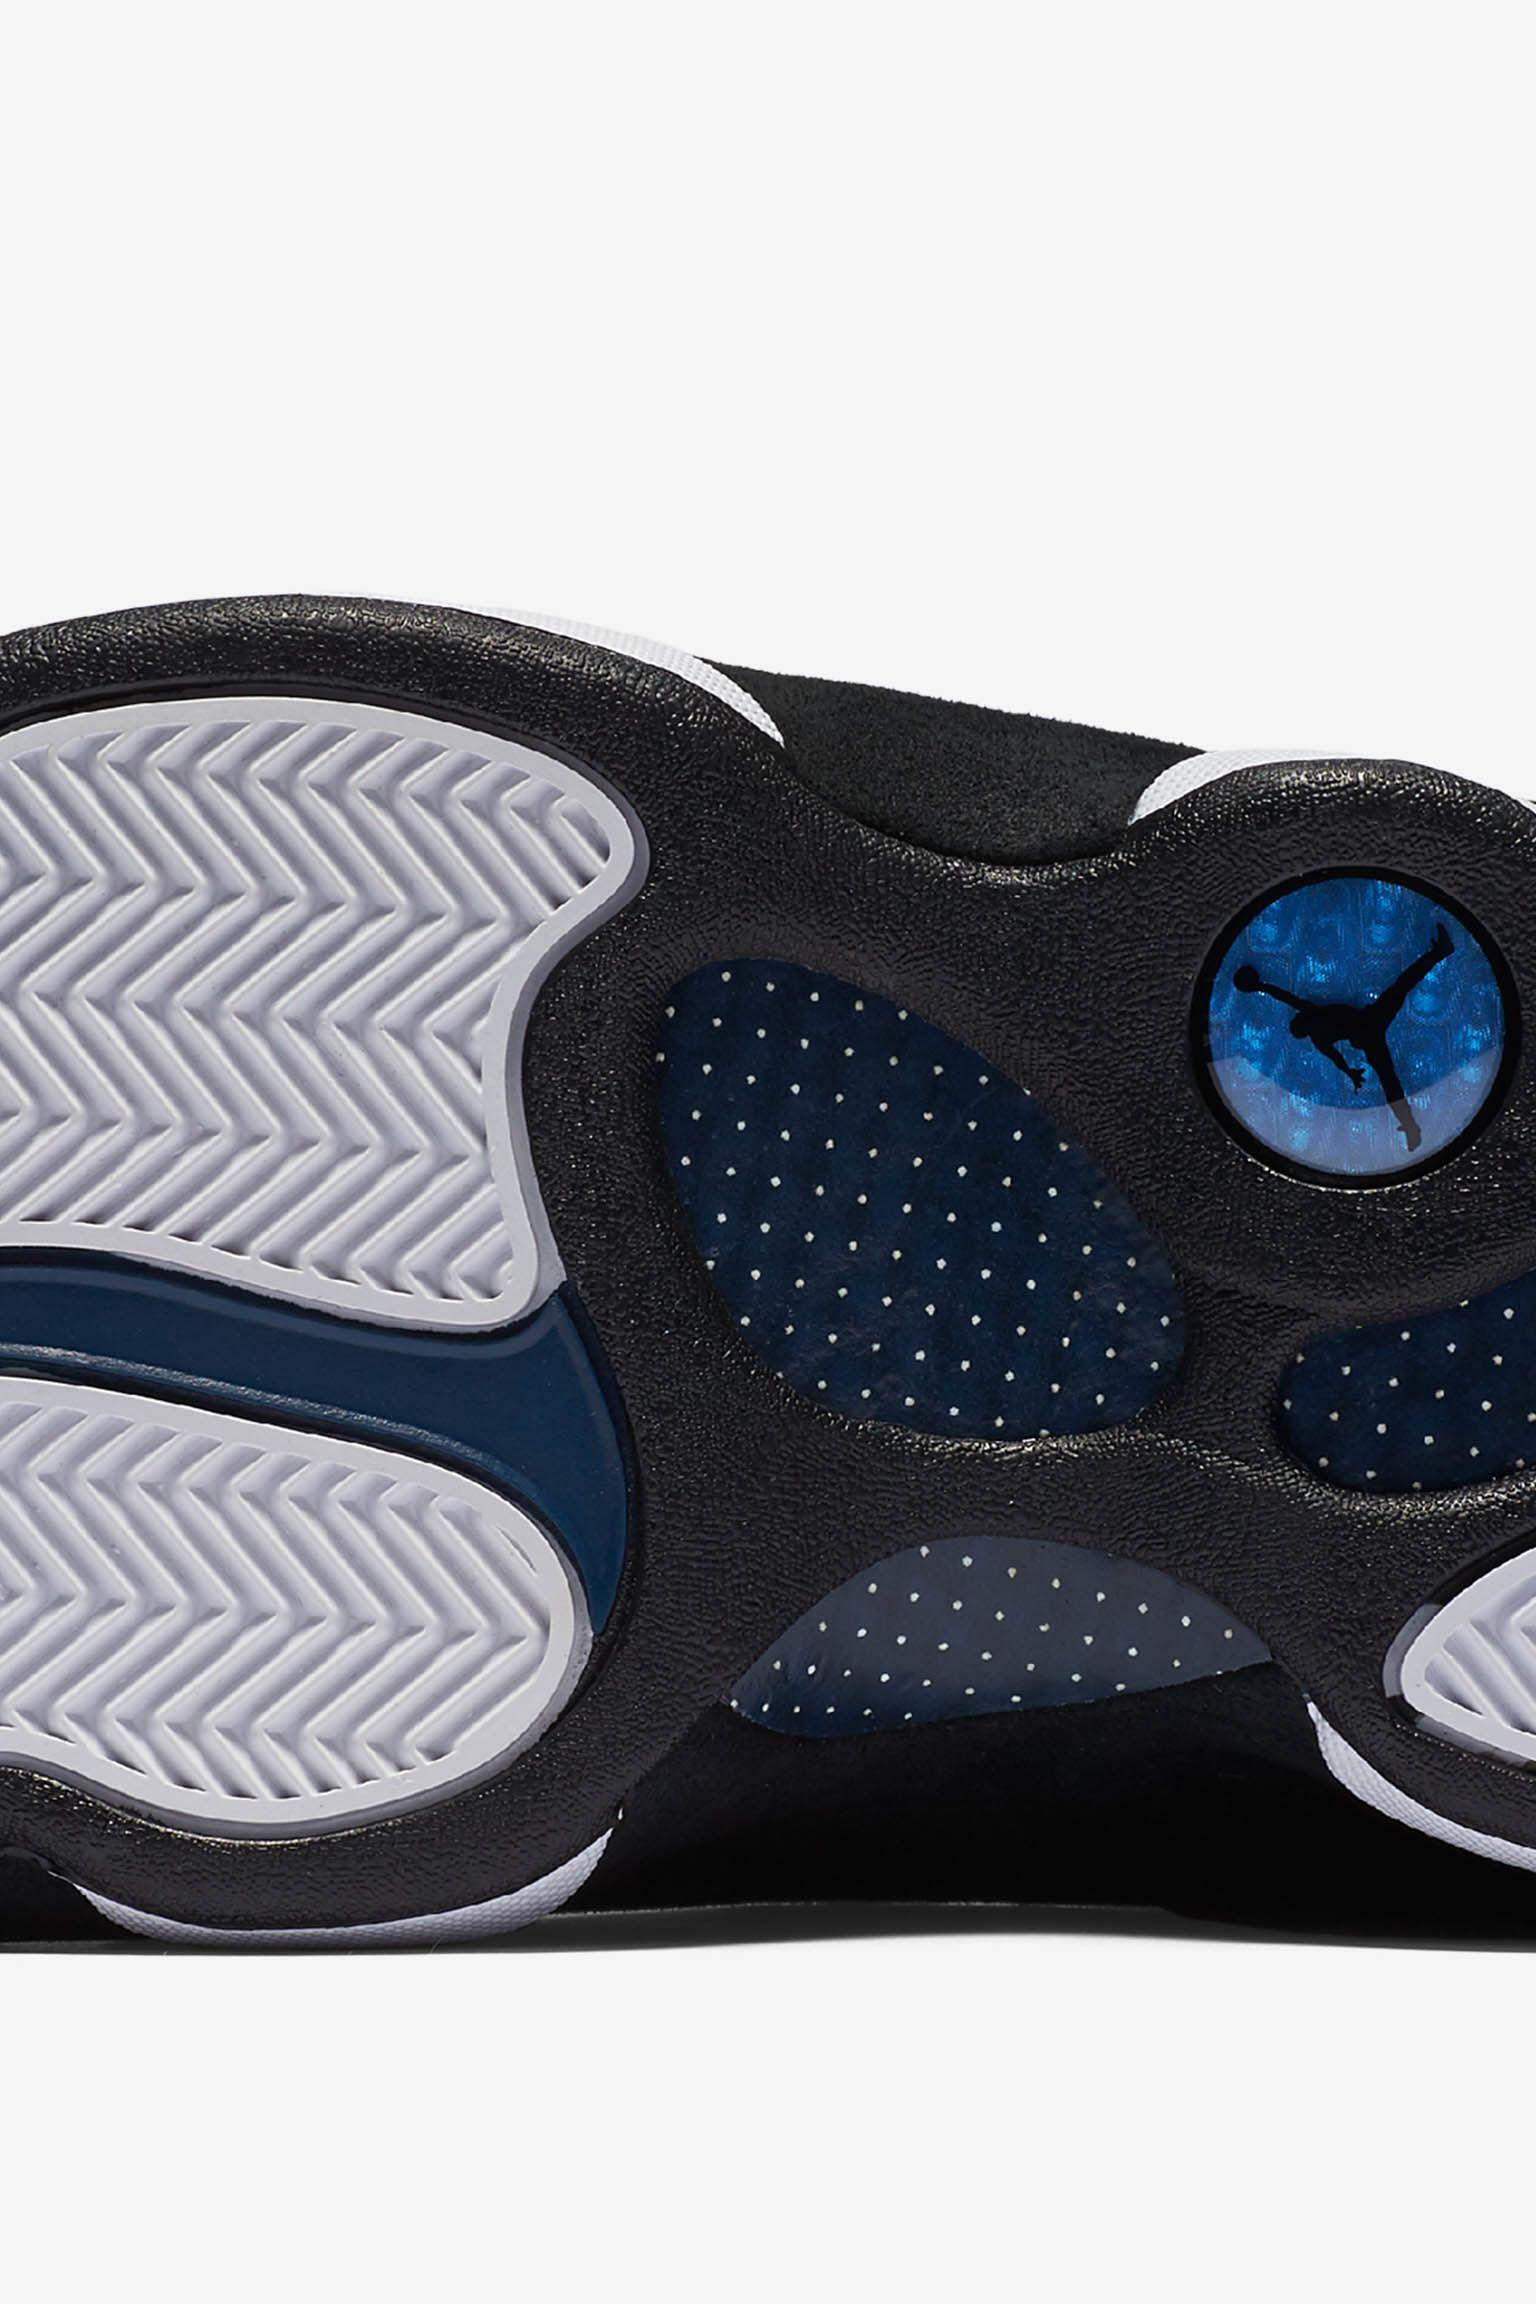 Air Jordan 13 Retro Low 'Black & Brave Blue'